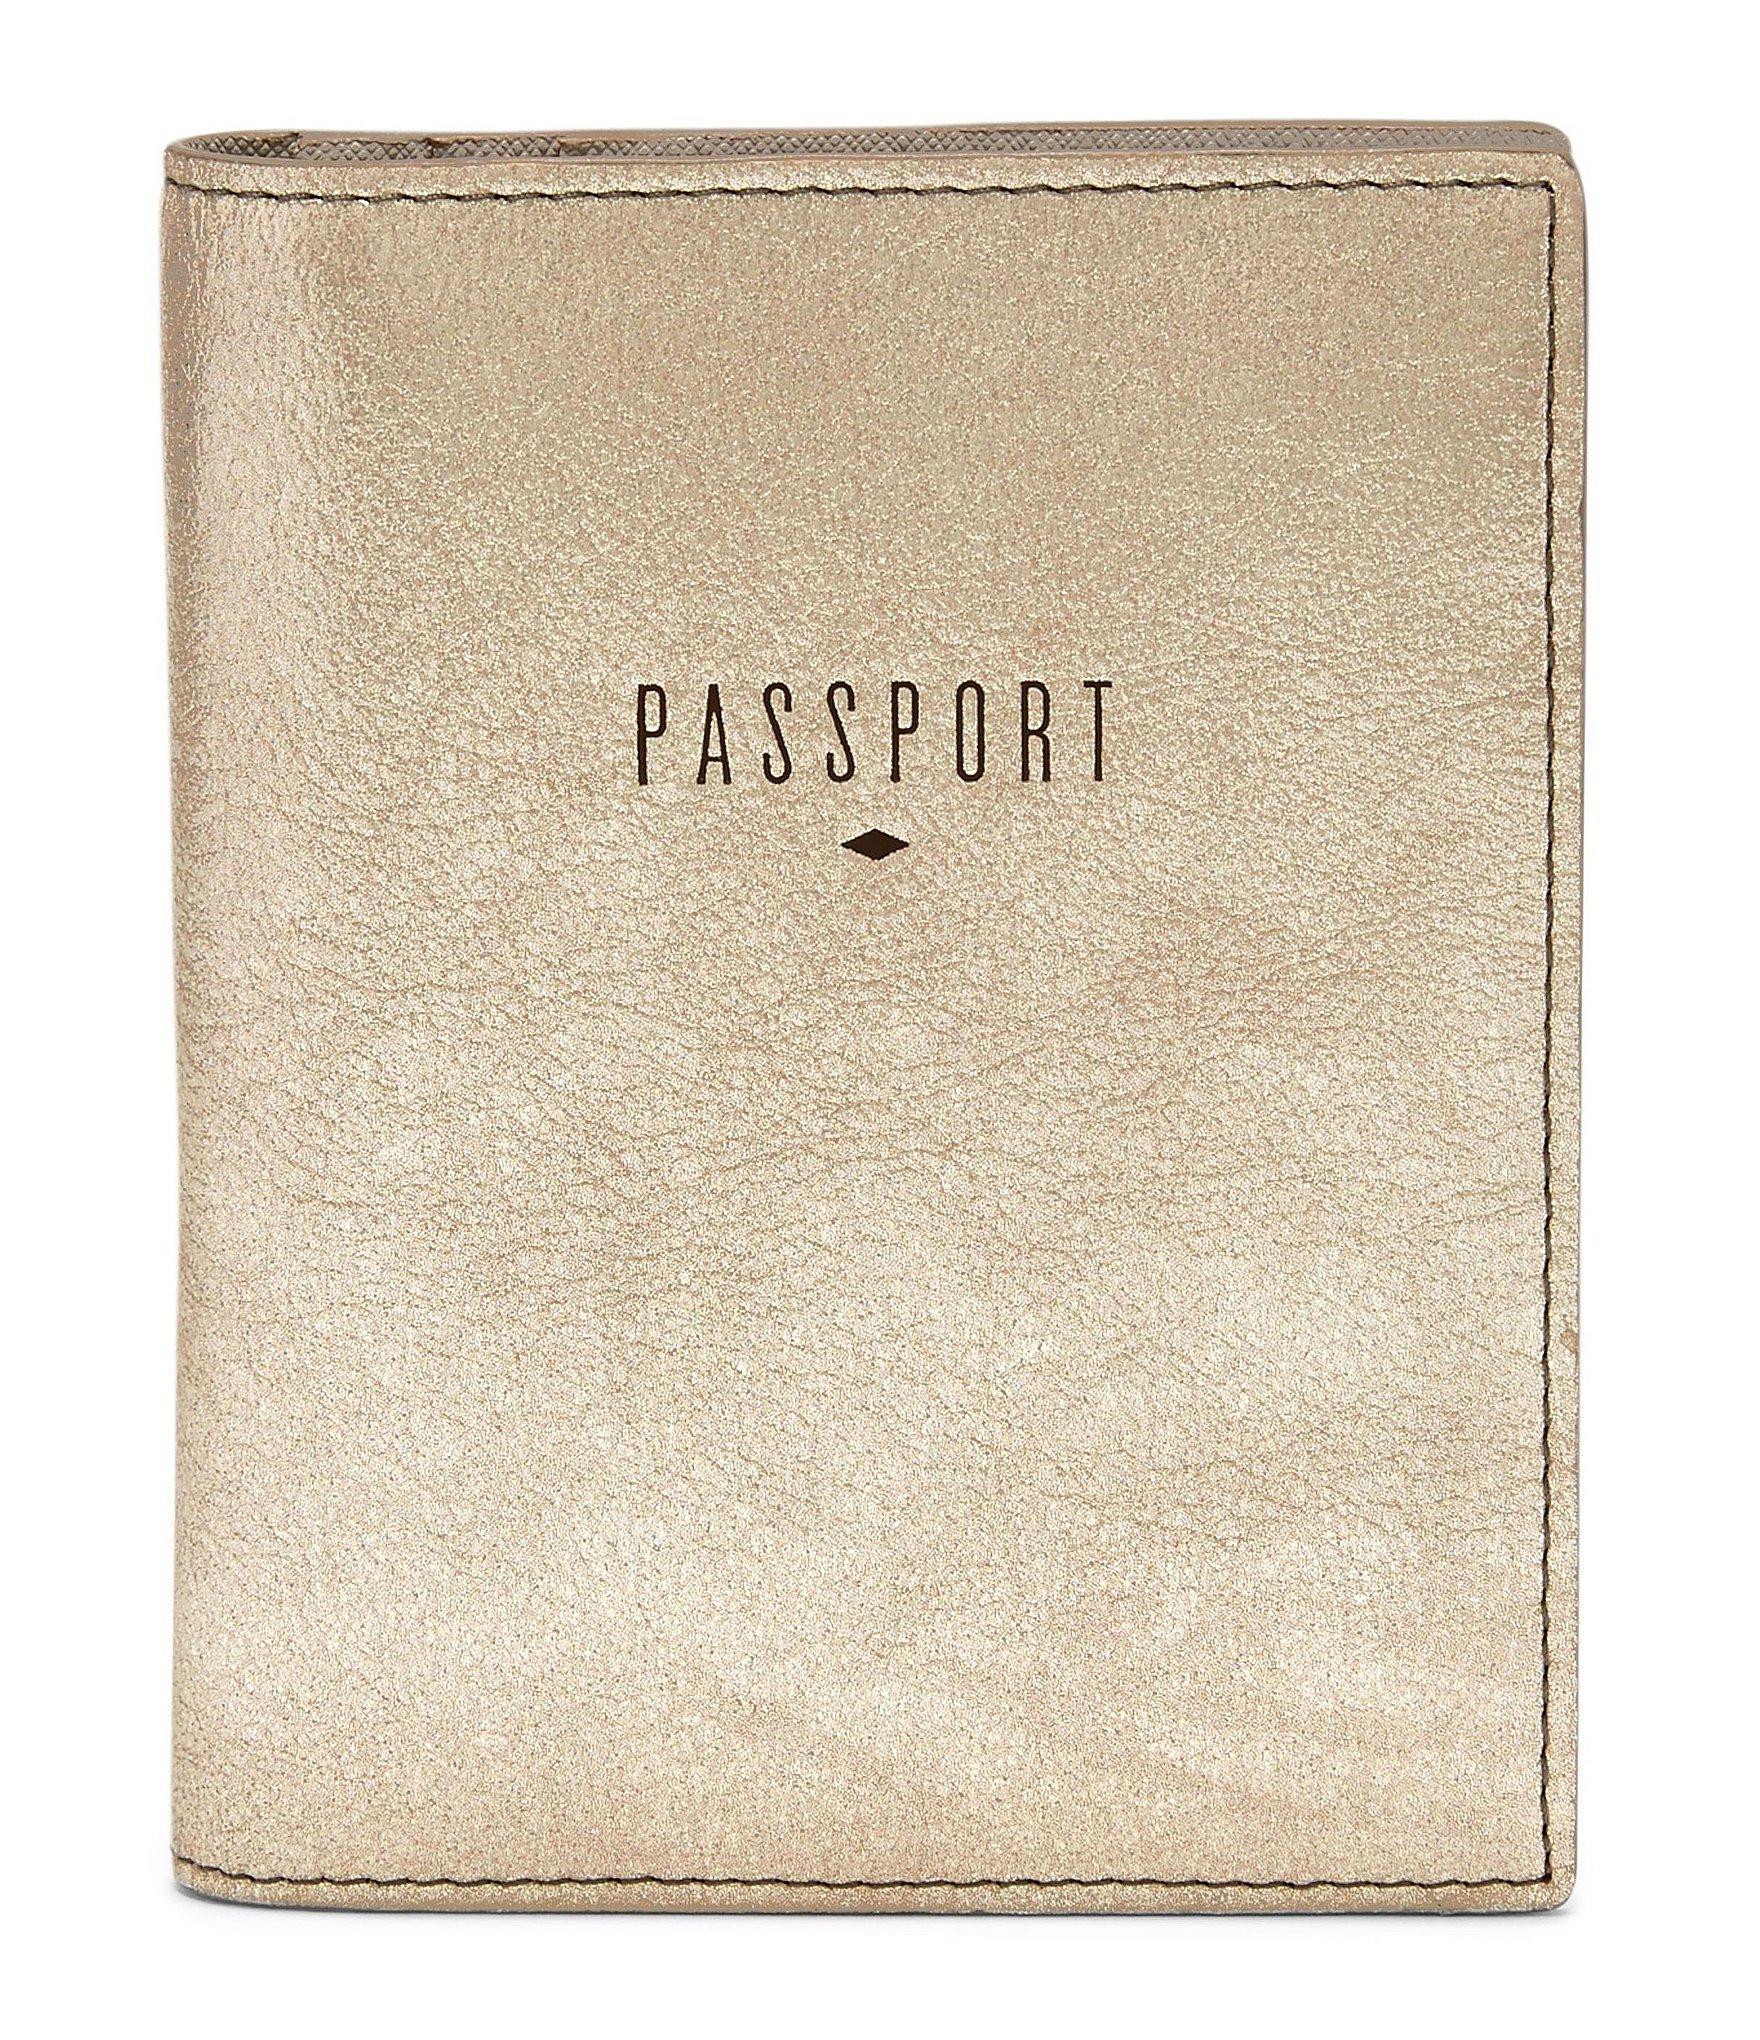 Lyst - Fossil Rfid Metallic Passport Case in Metallic for Men